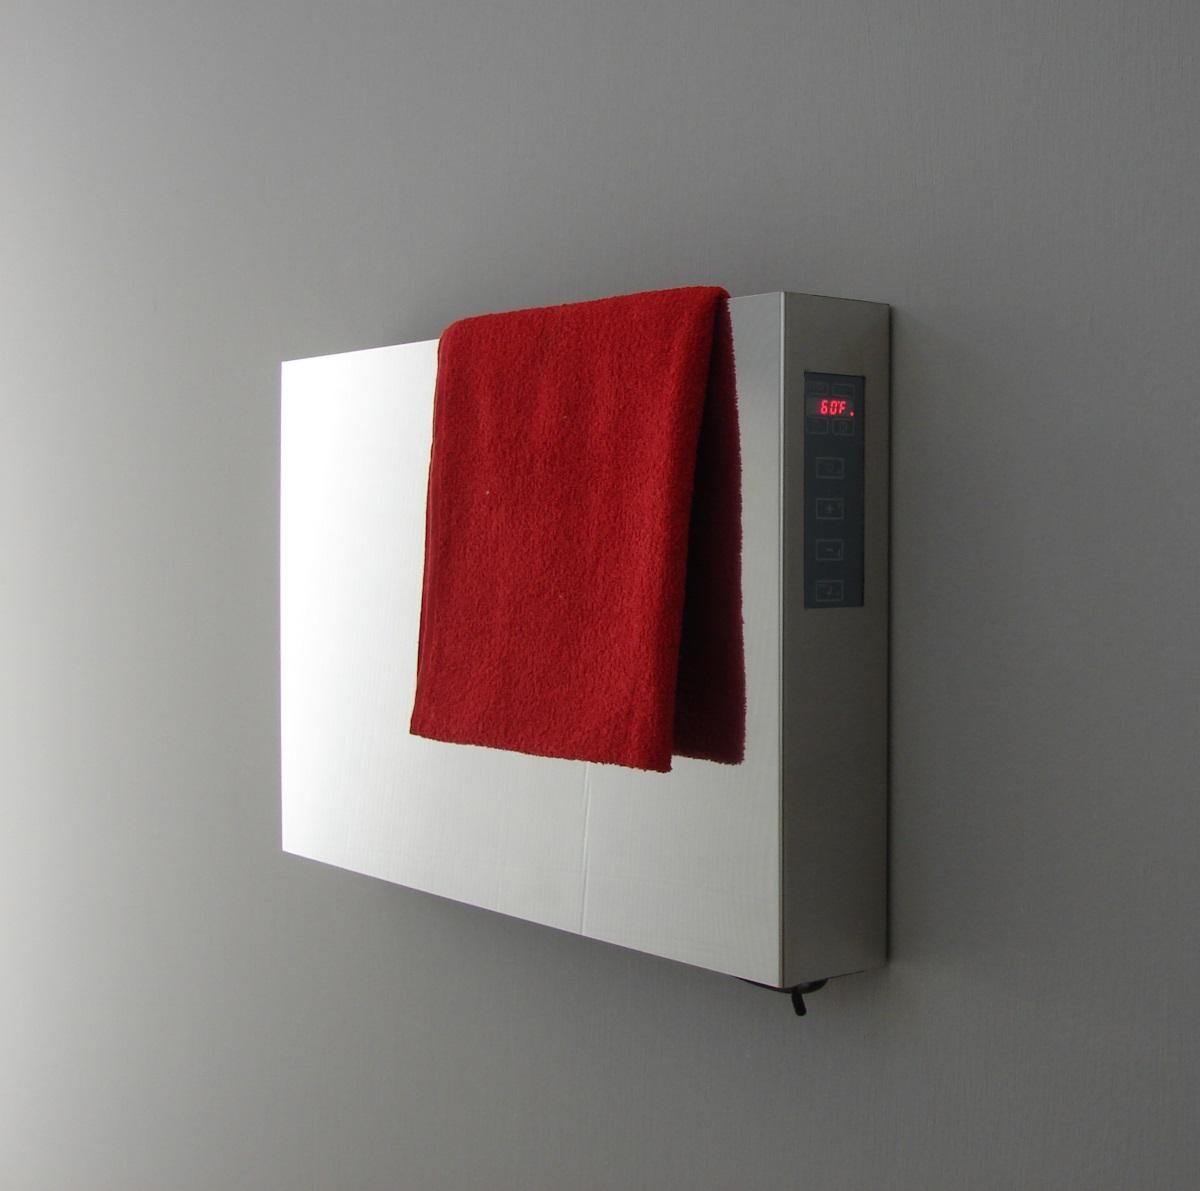 Awesome Amba Towel Warmers for Best Tower Warmer Inspiration: Amba Towel Warmers | Wall Mounted Towel Warmer | Home Depot Bathroom Towel Racks